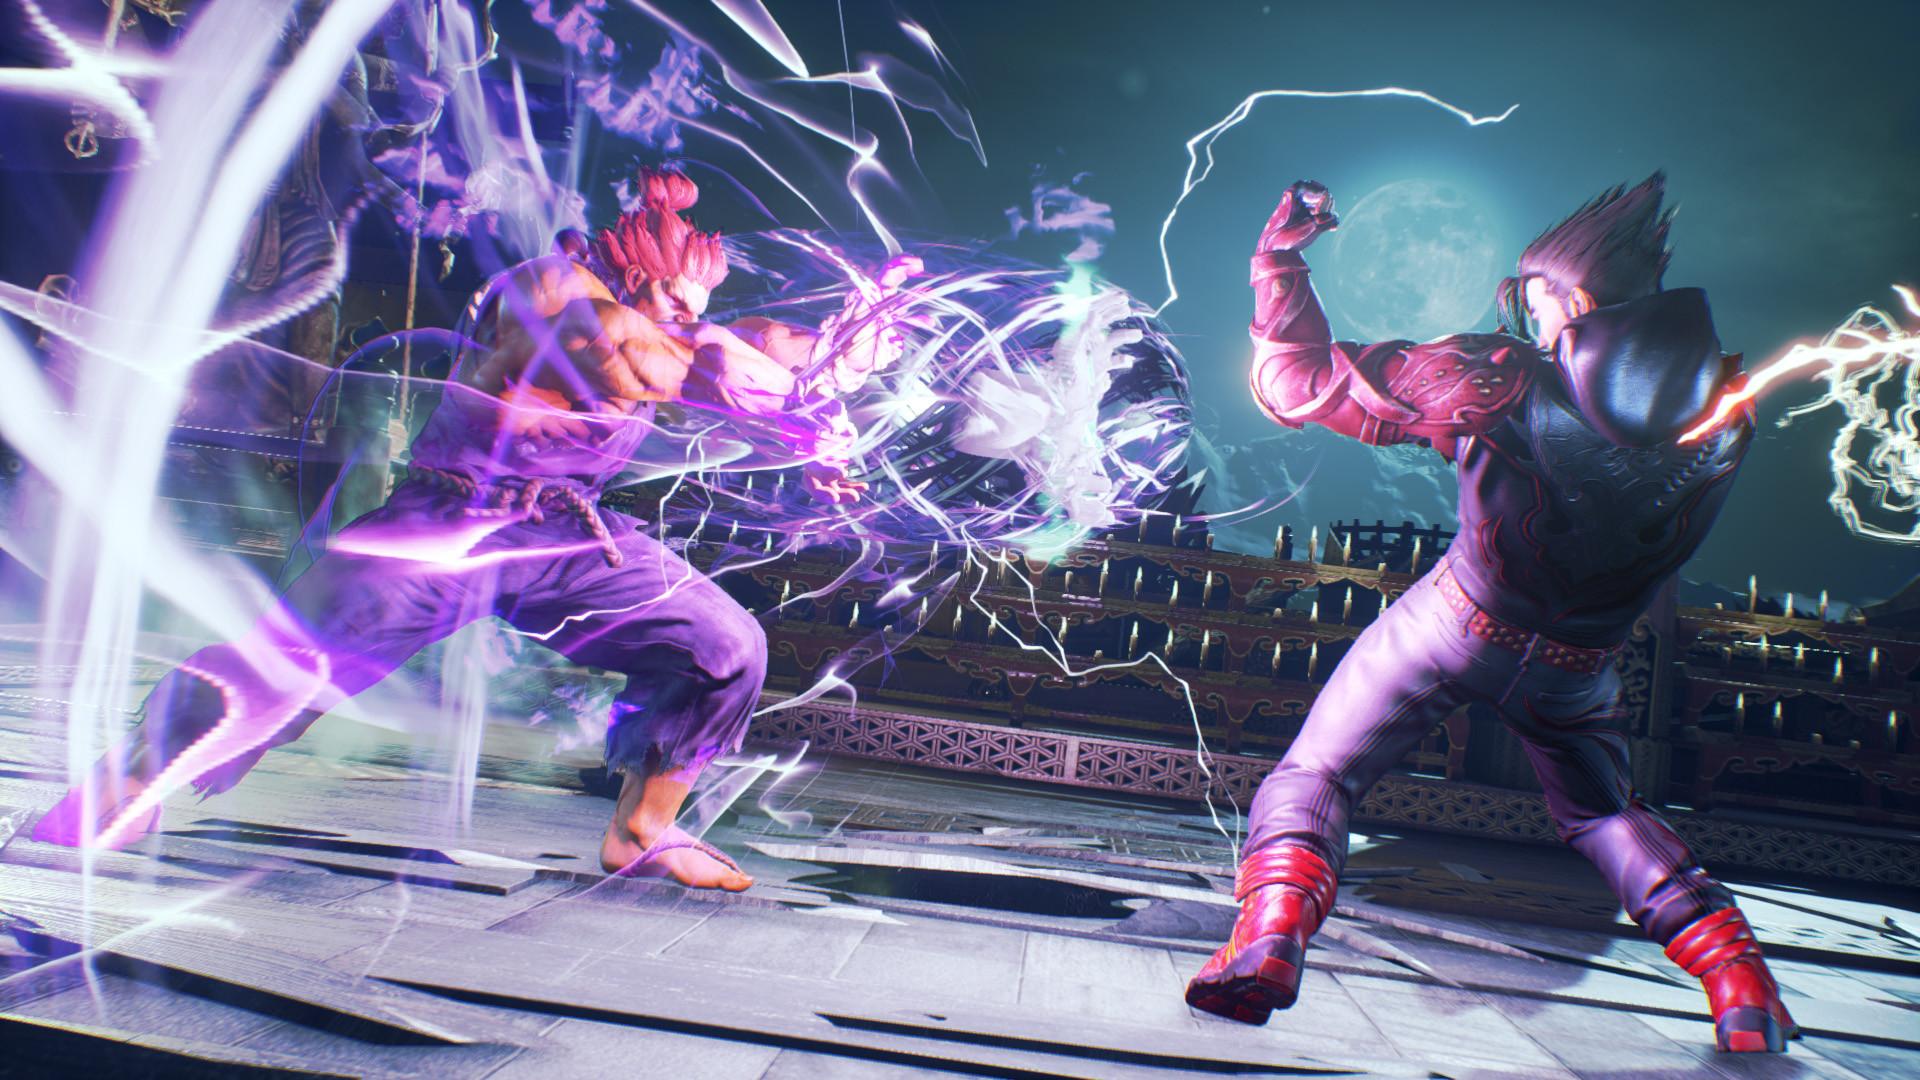 Tekken 7 is still going strong as it hits five million copies sold screenshot